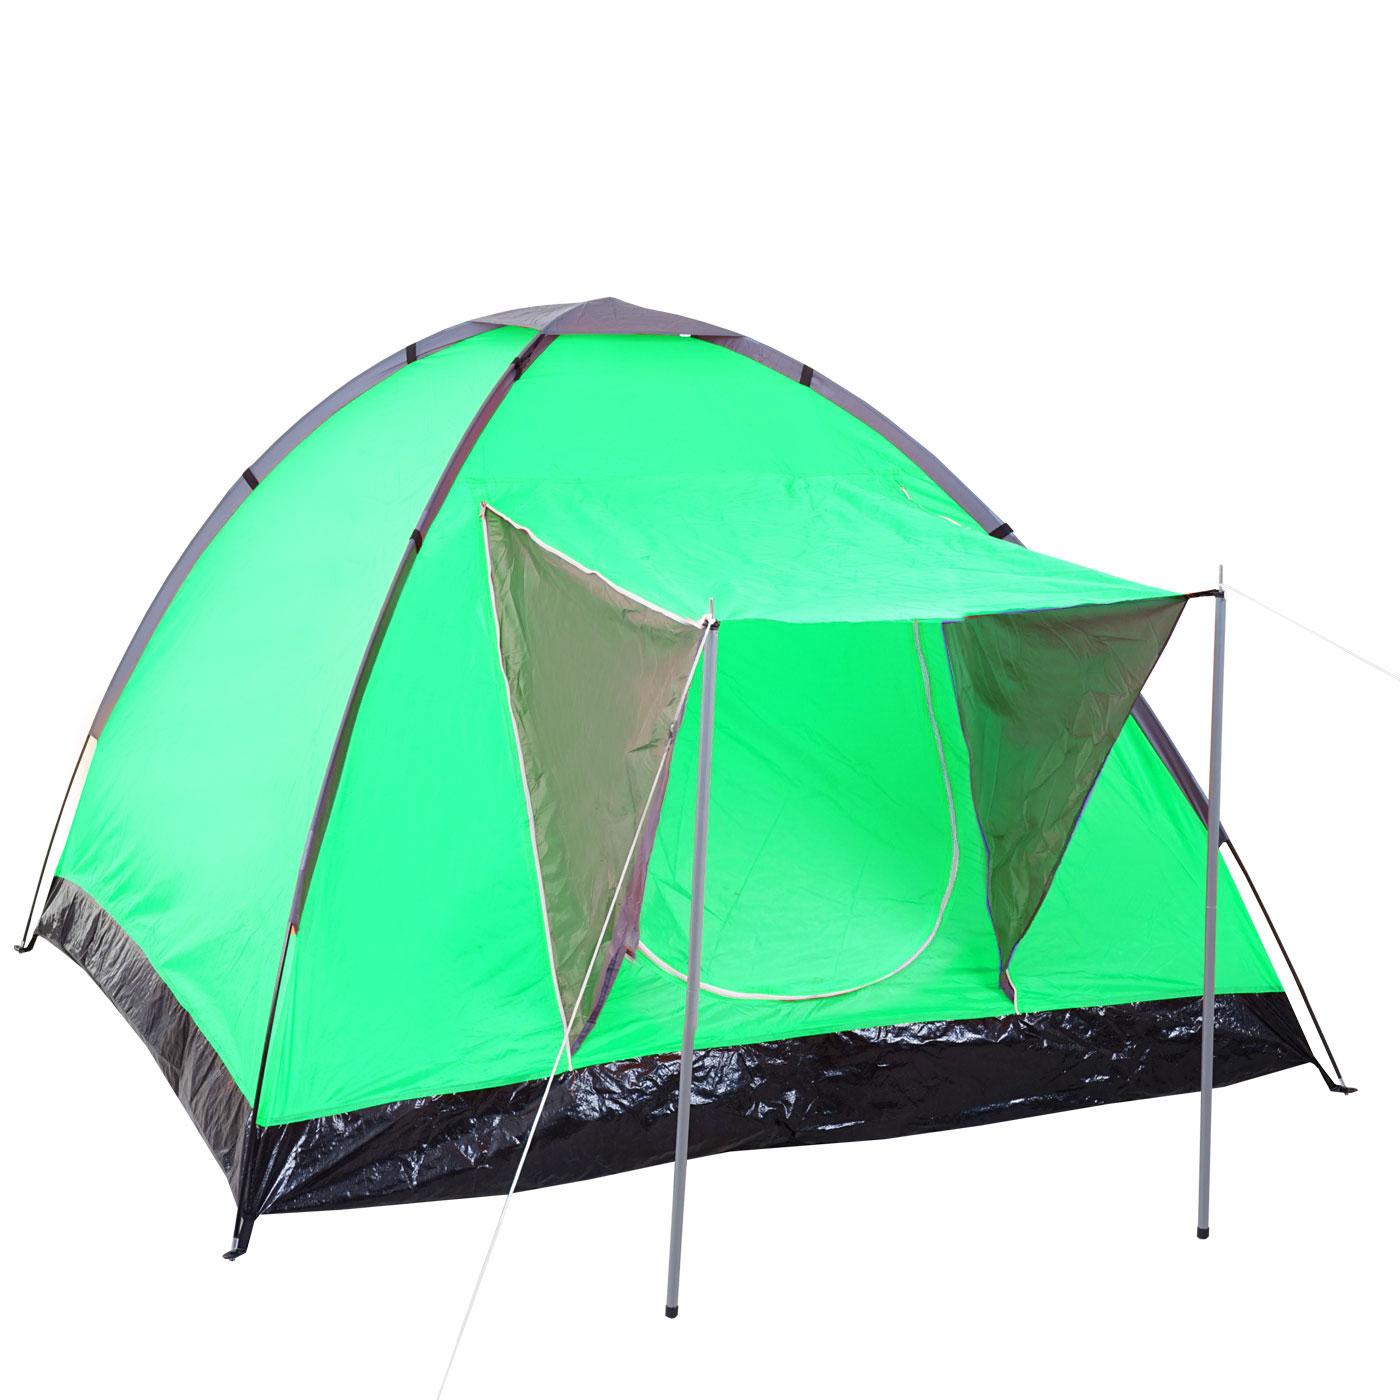 tente de camping loksa 2 personnes bivouac igloo tente pour festival vert ebay. Black Bedroom Furniture Sets. Home Design Ideas